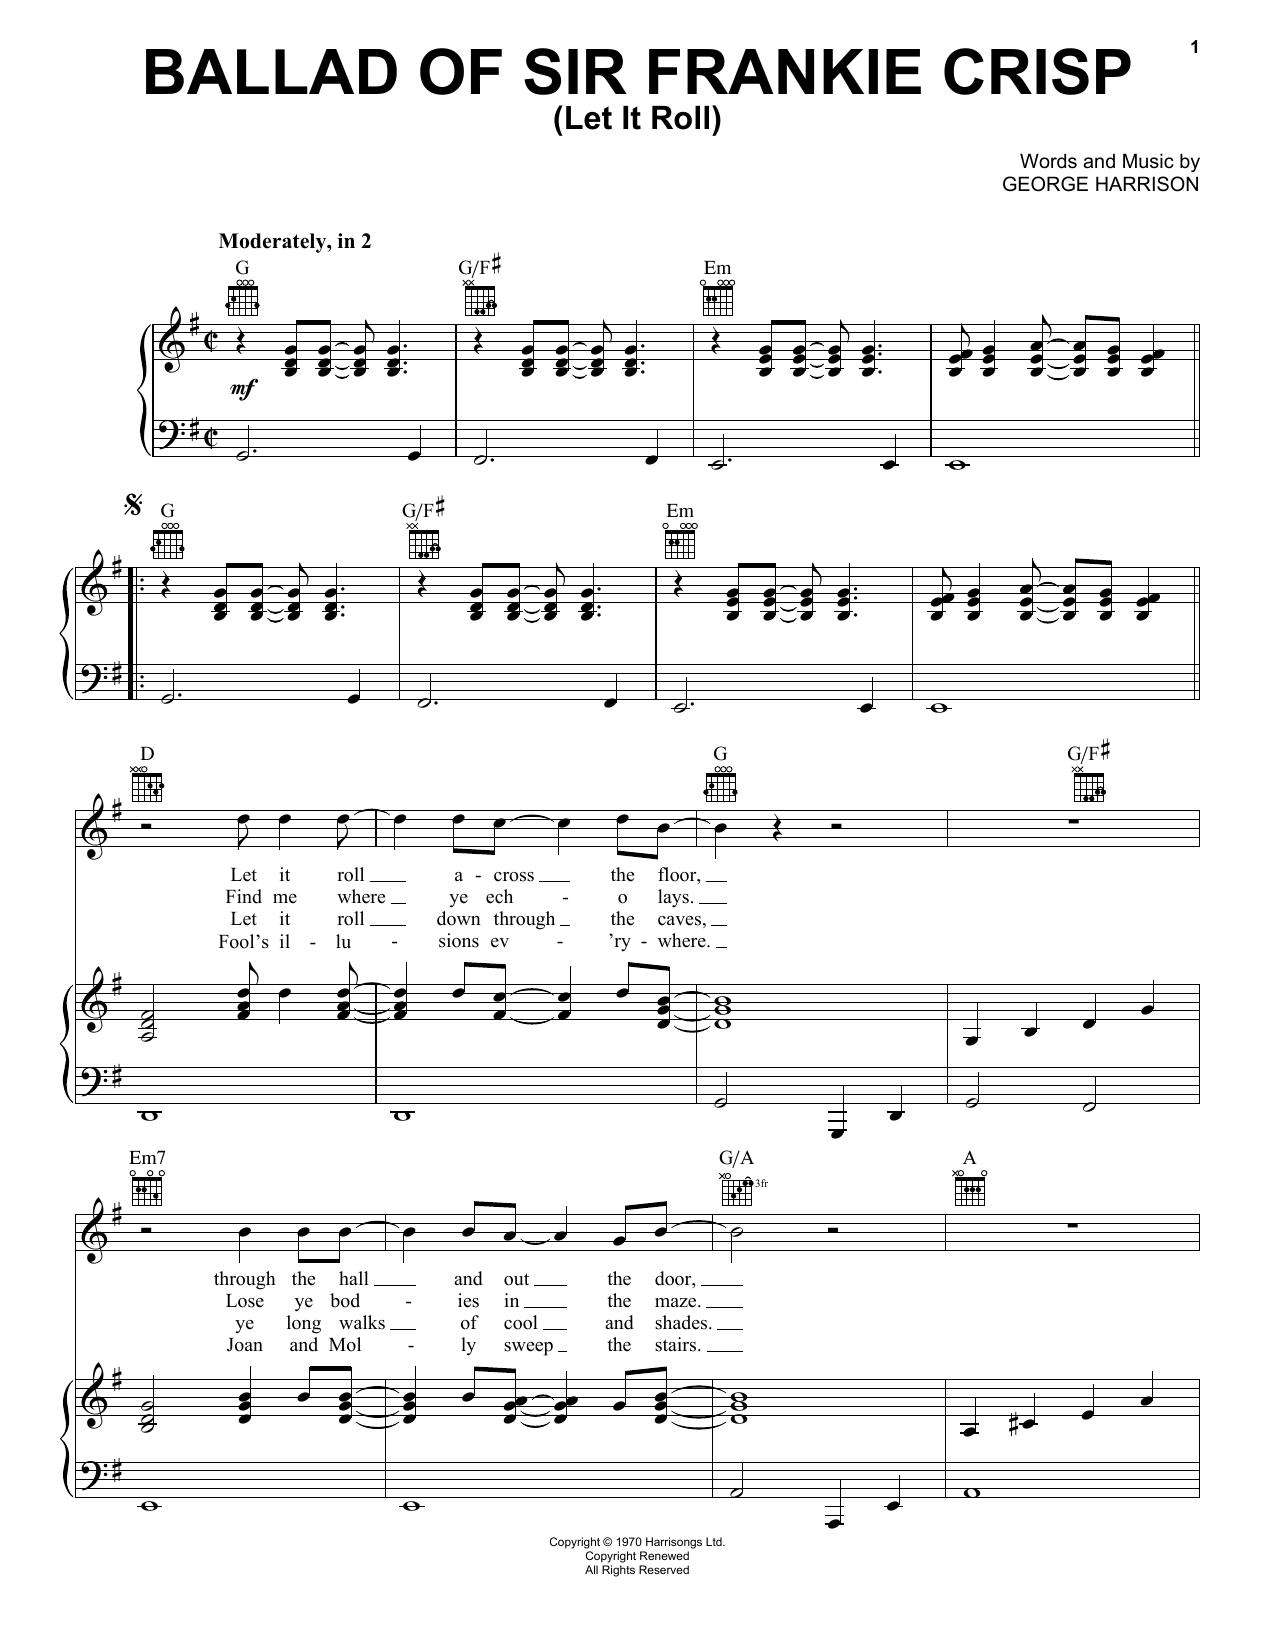 Ballad Of Sir Frankie Crisp (Let It Roll) Sheet Music